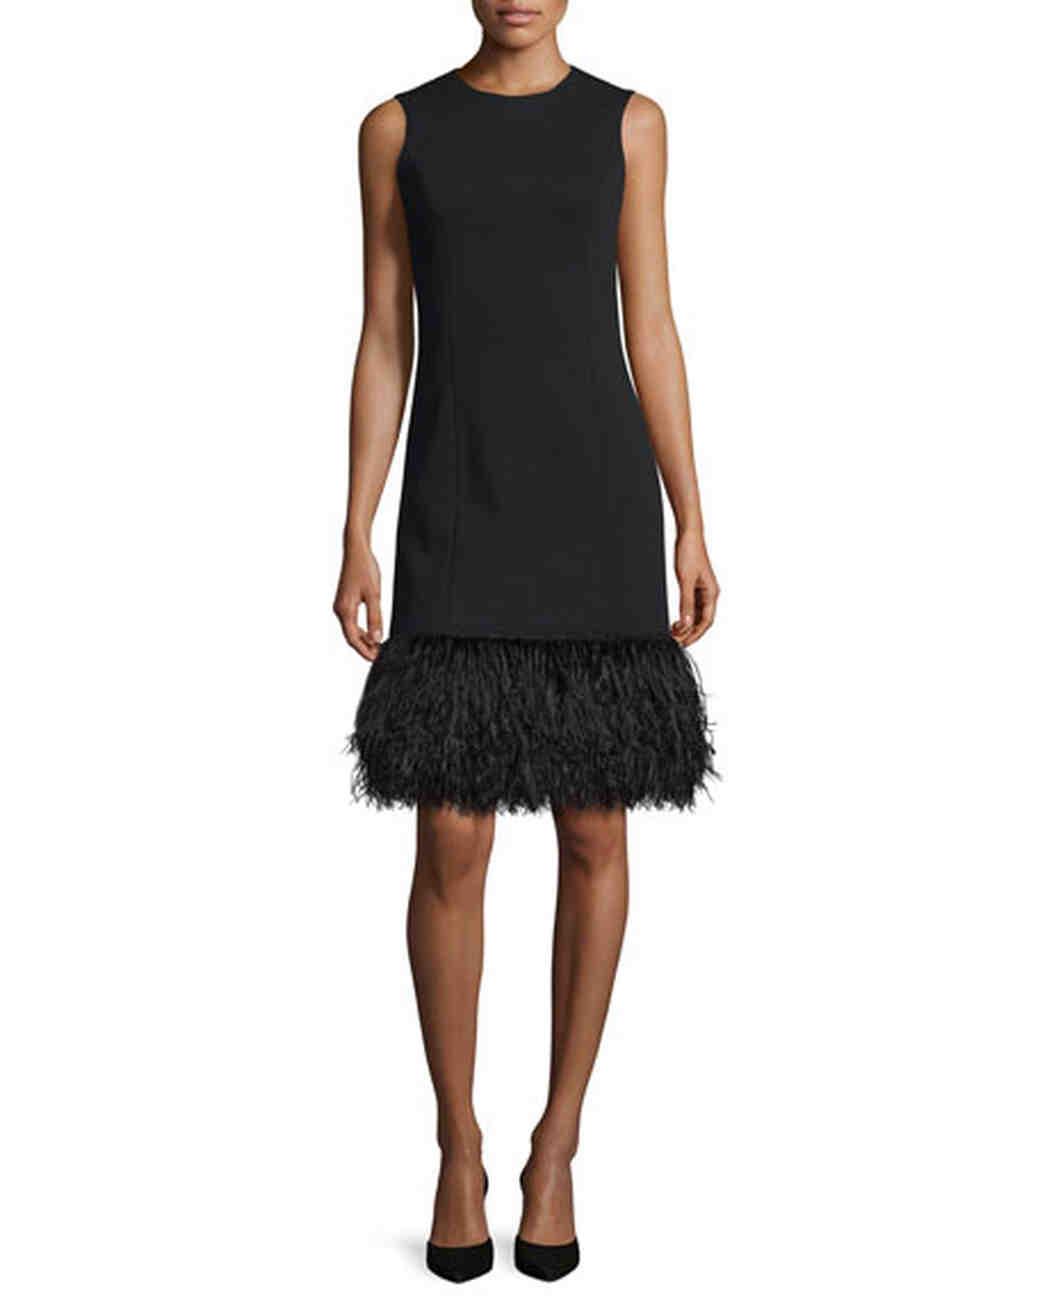 Black Feather Hem Dress